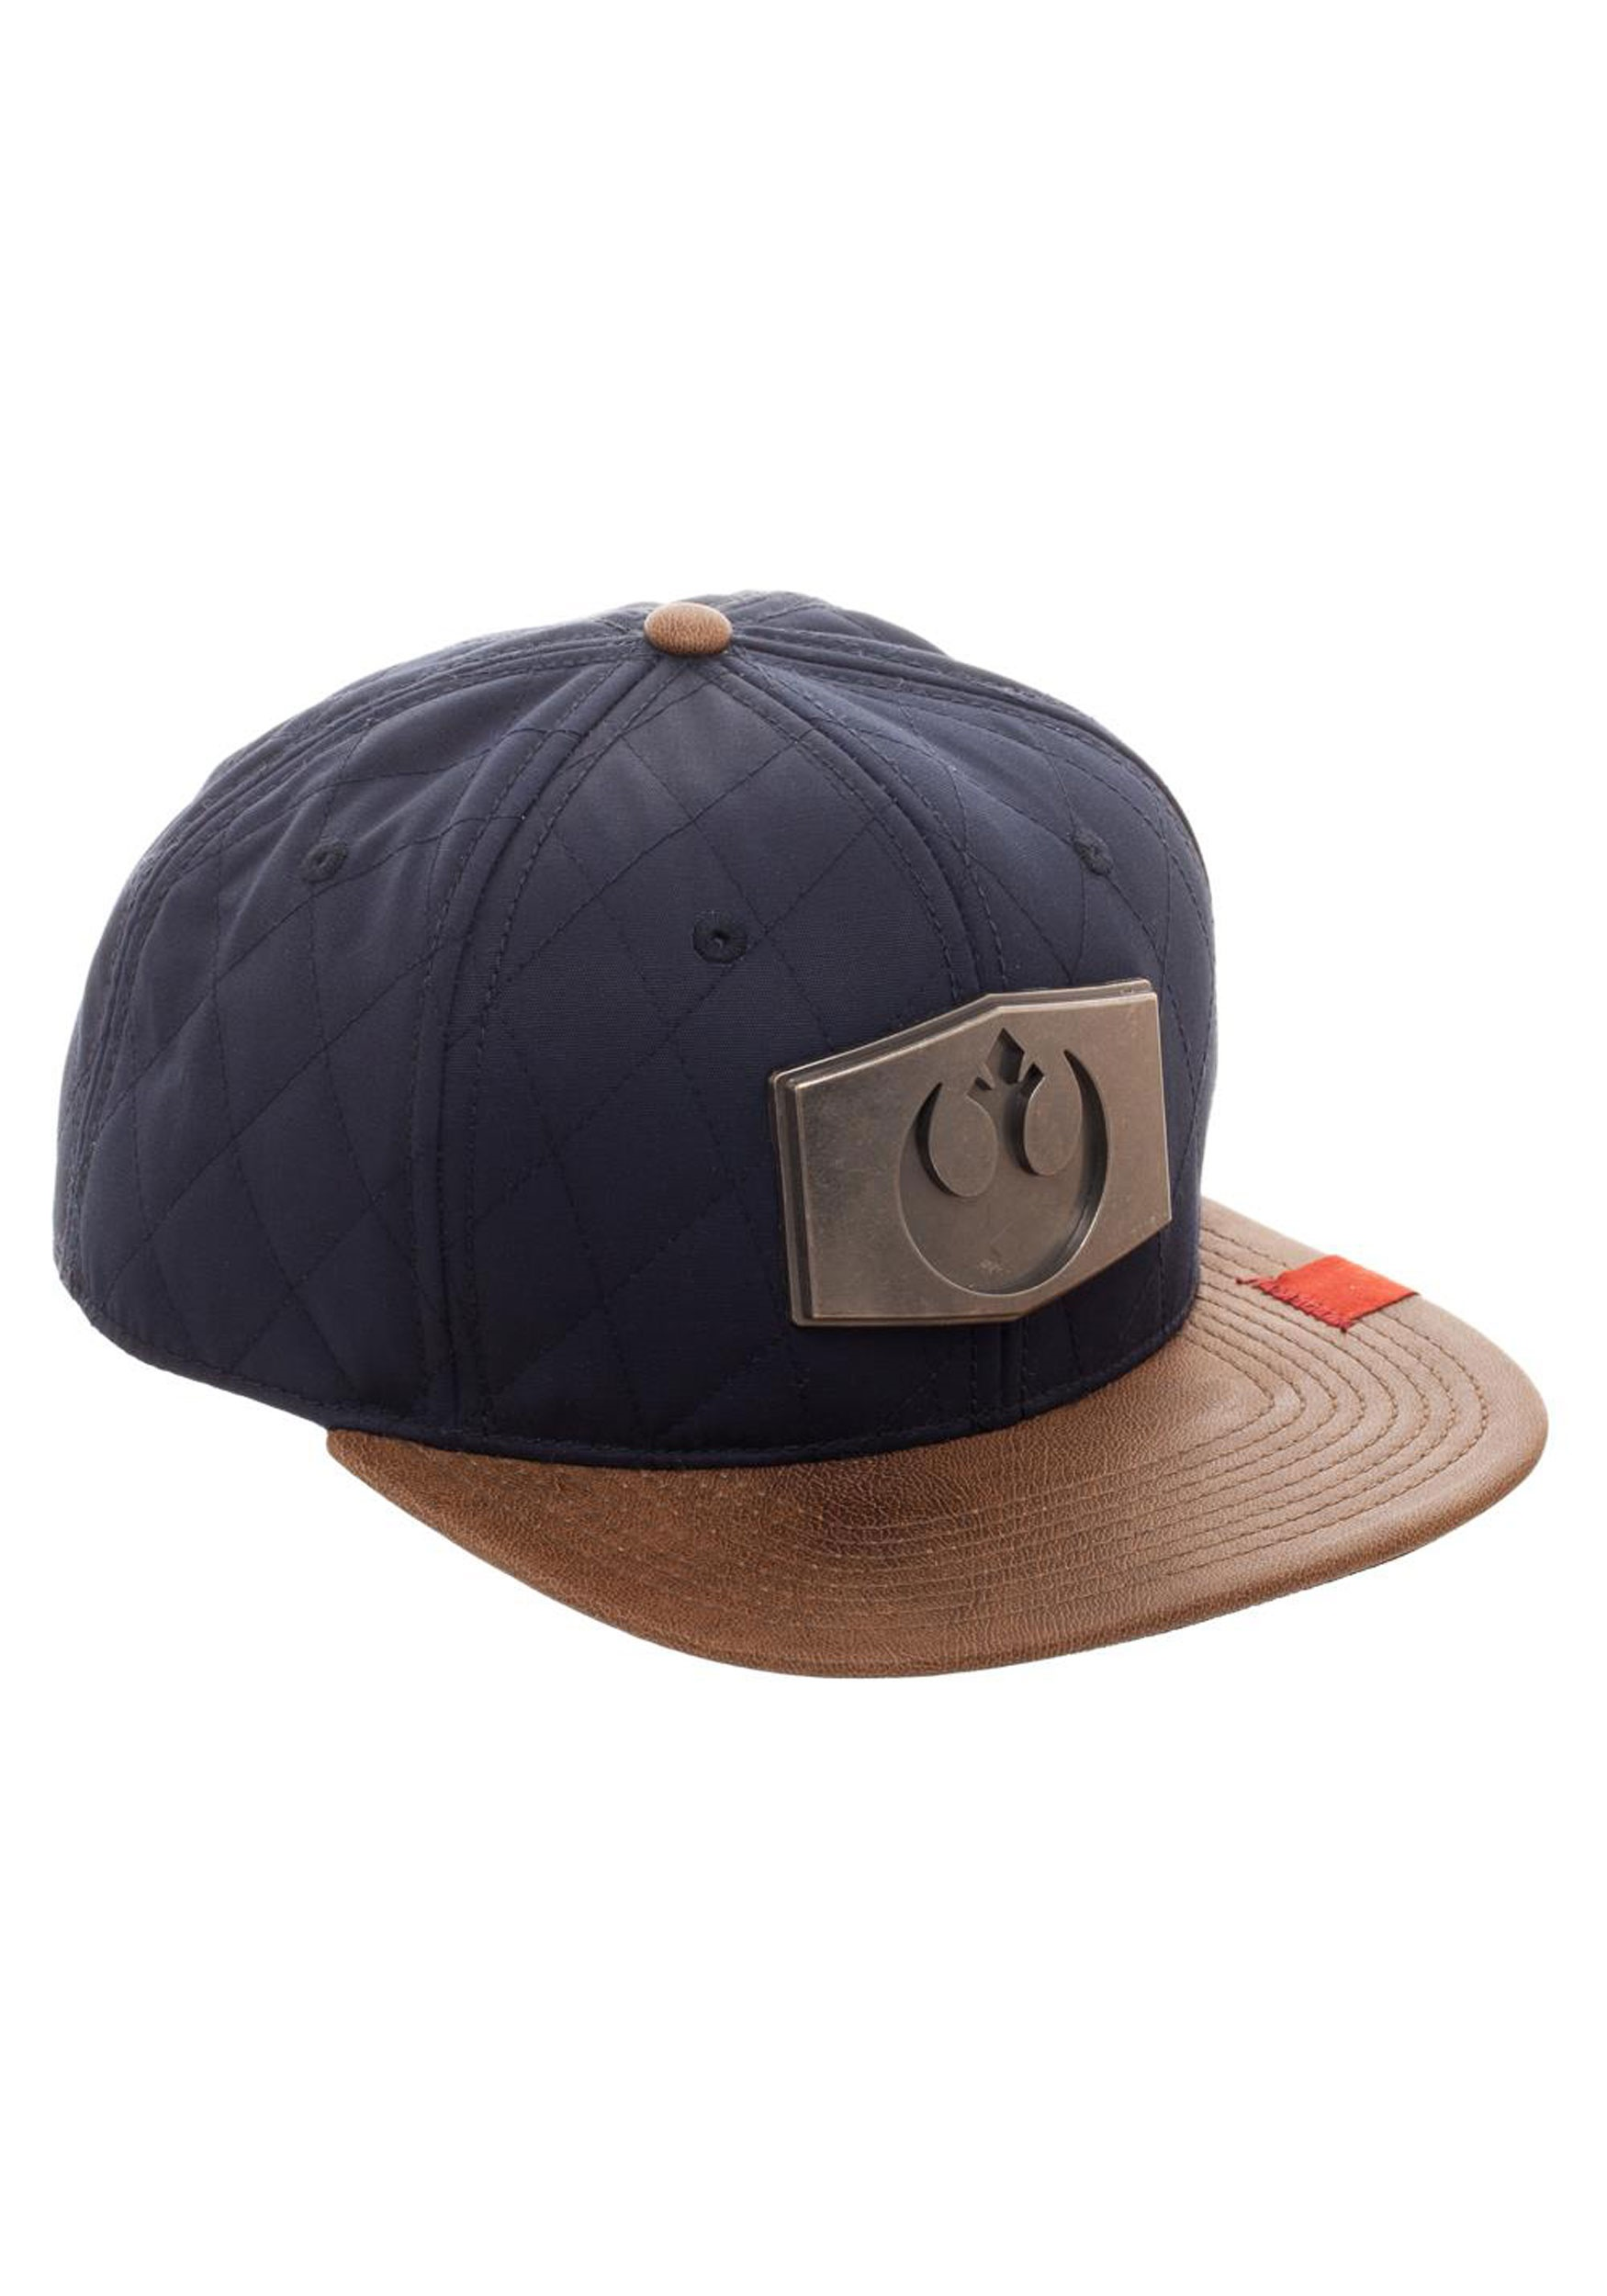 Star Wars Han Solo Inspired Snapback Hat-8768